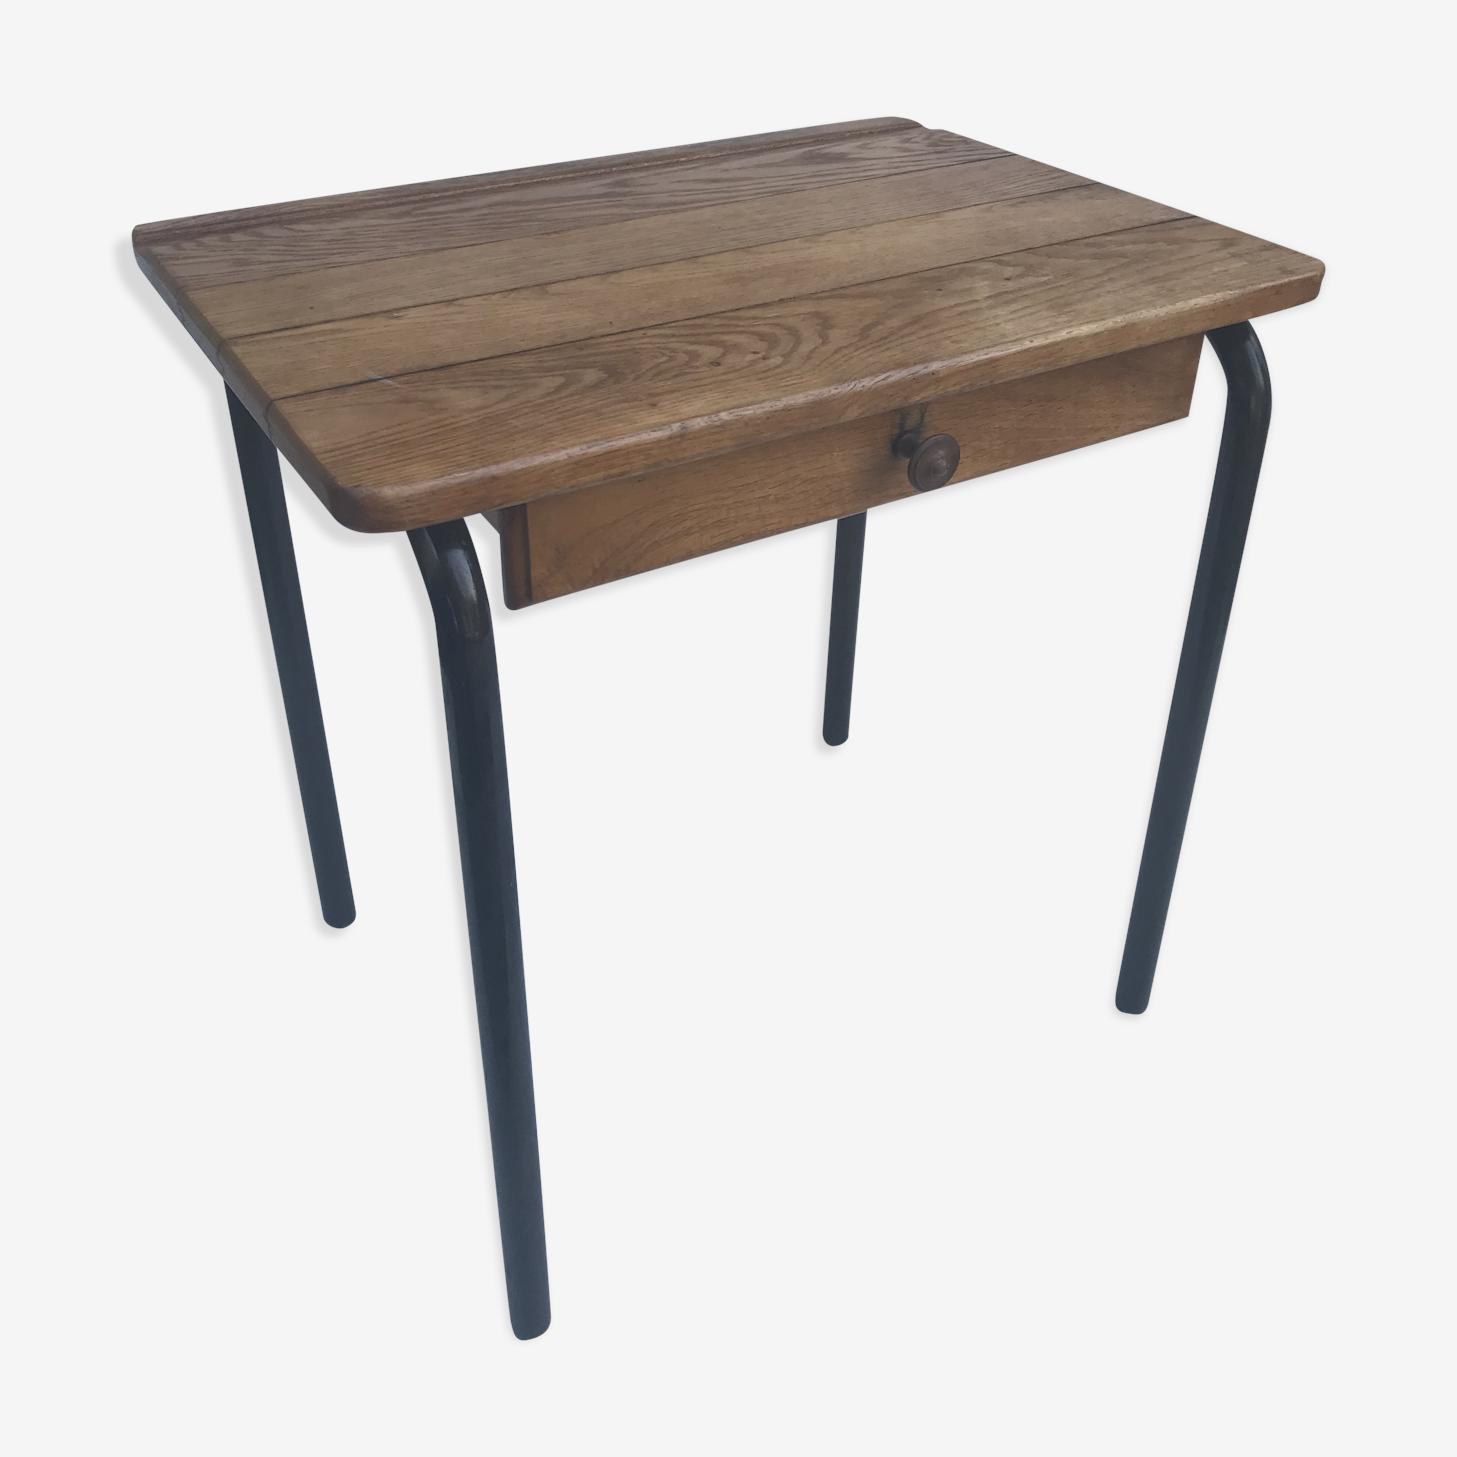 Table desk school child metal black and wood 50's vintage